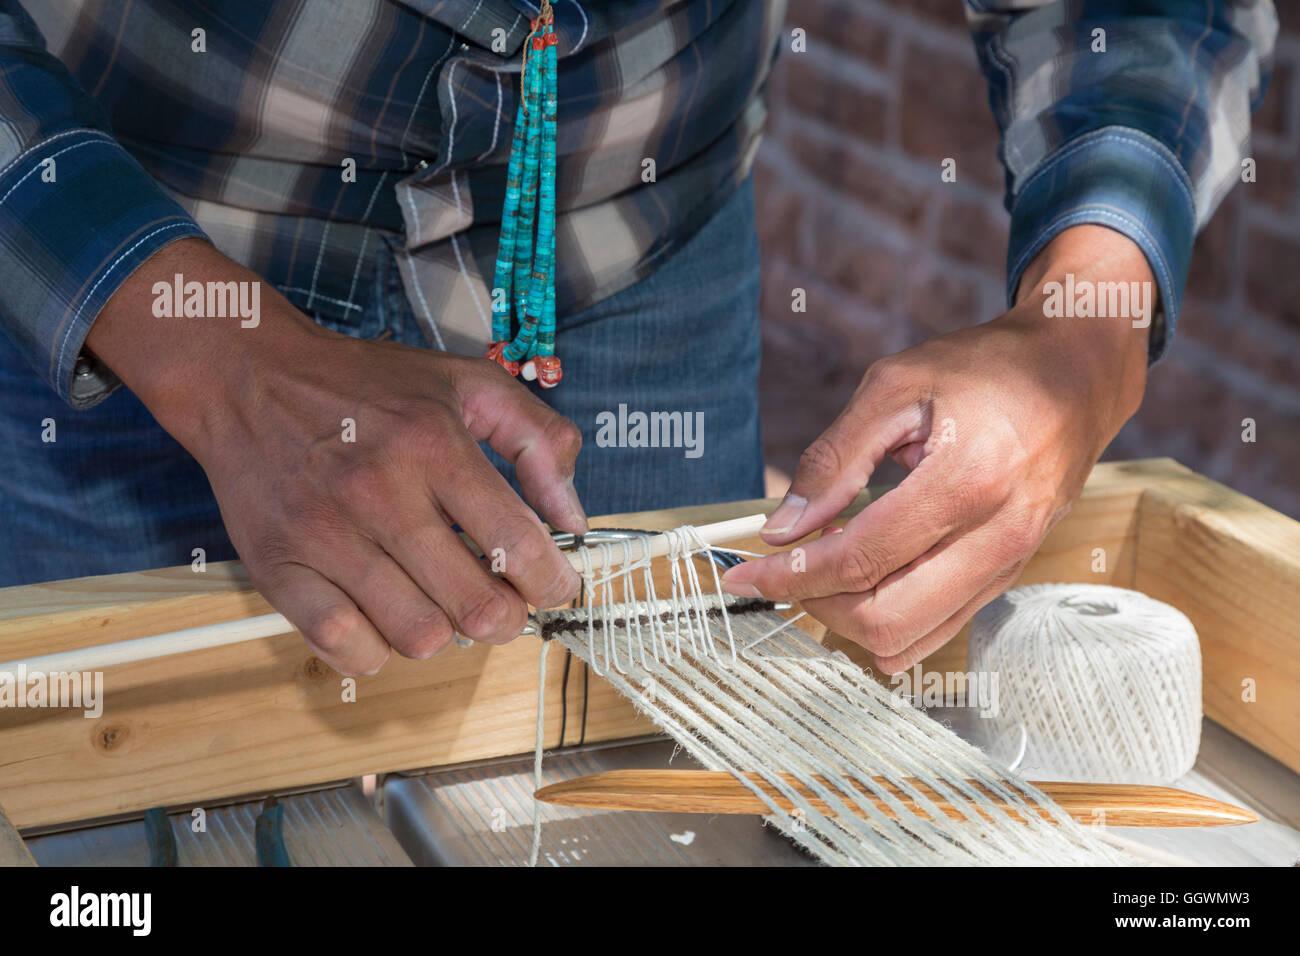 Ganado, Arizona - A sheep, wool, and weaving workshop at the Hubbell Trading Post on the Navajo Nation. - Stock Image